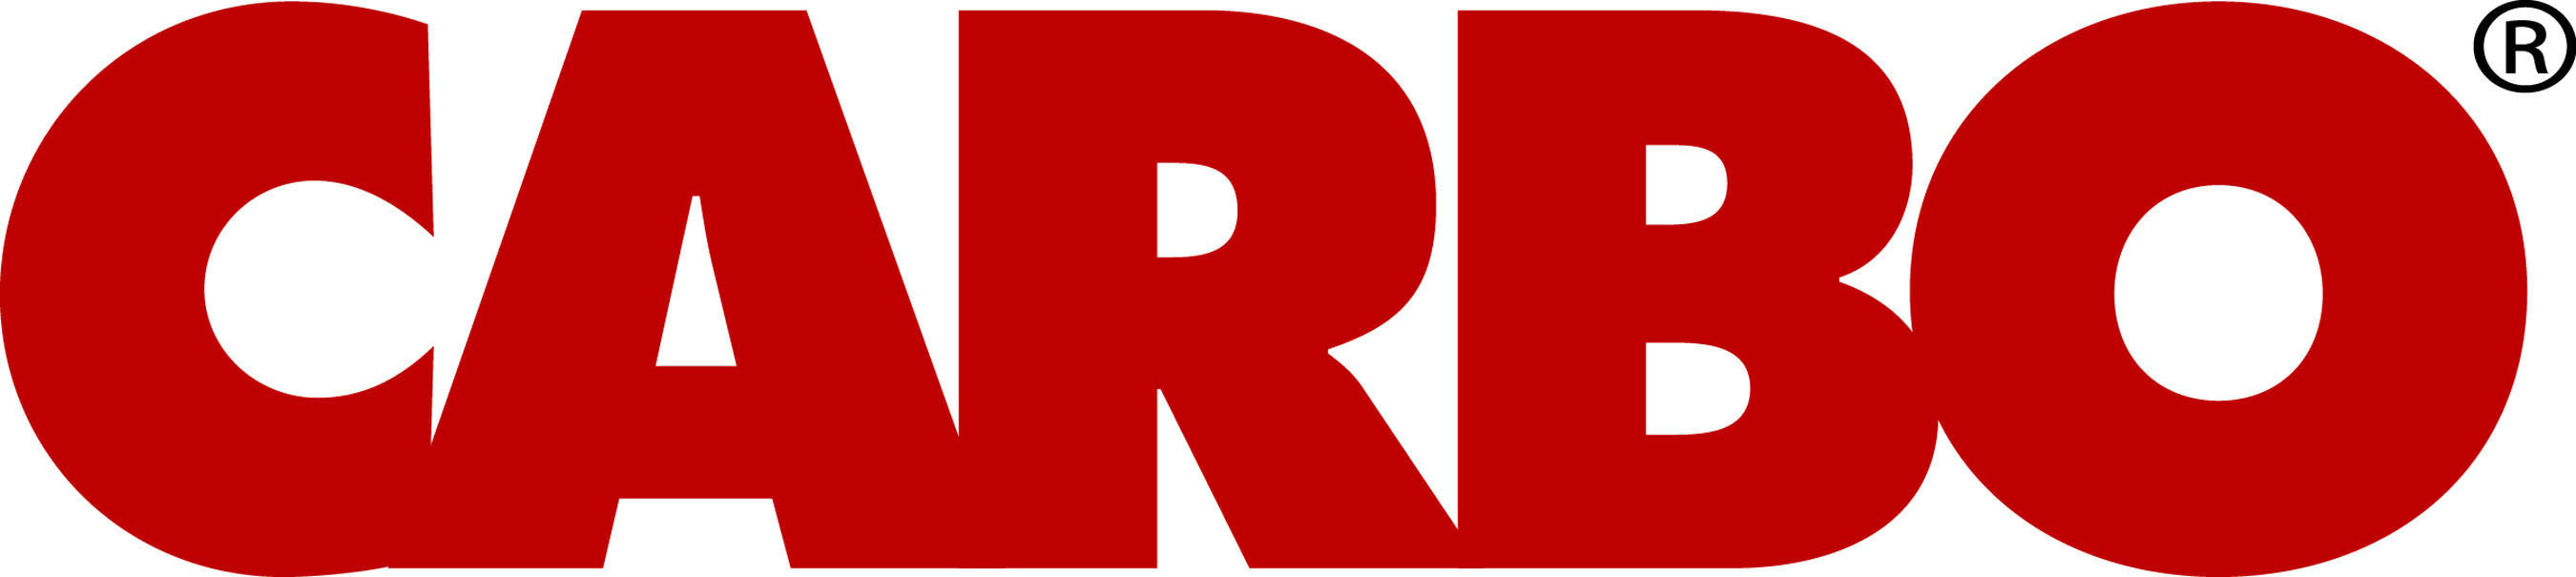 CARBO' Announces Second Quarter 2016 Results